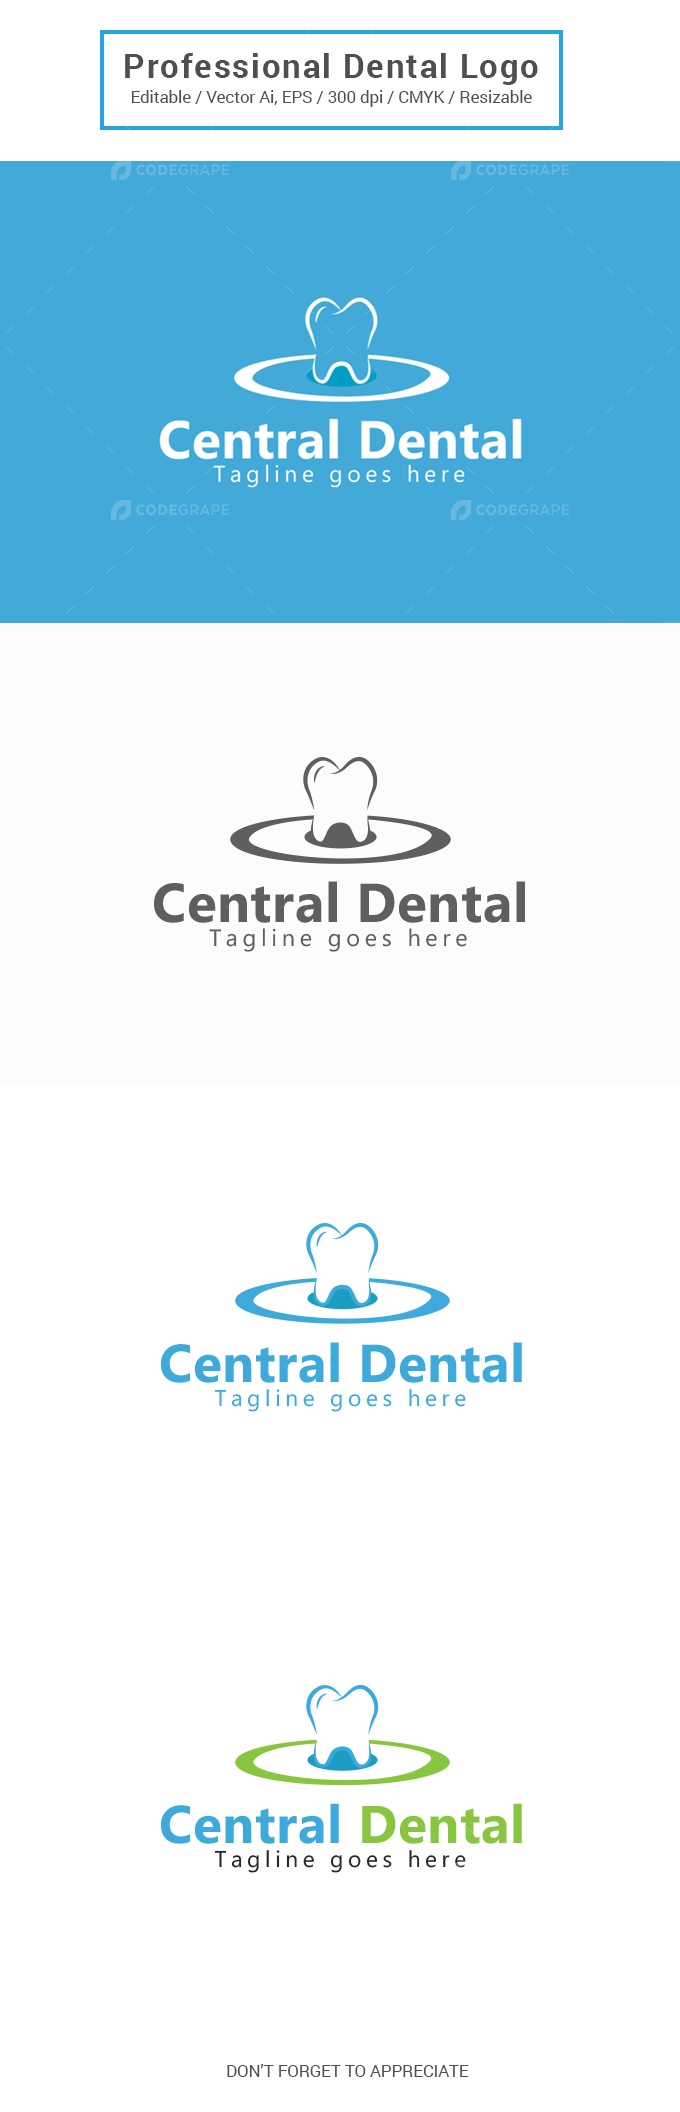 Central Dental Logo